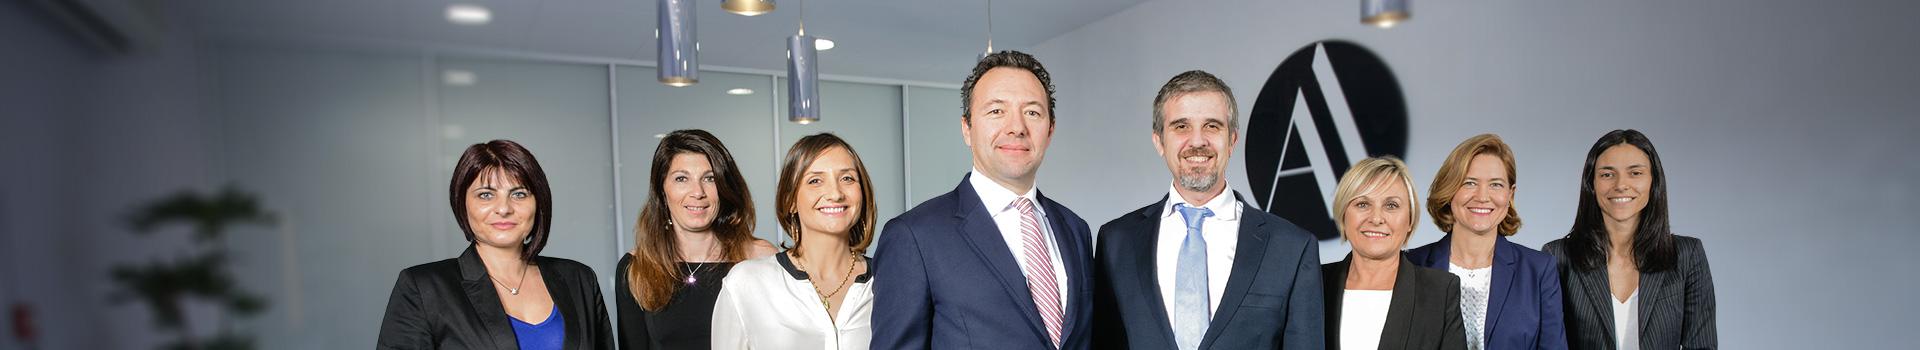 L 39 quipe du cabinet d 39 avocat international alvarez arlabosse - Cabinet d avocat international ...